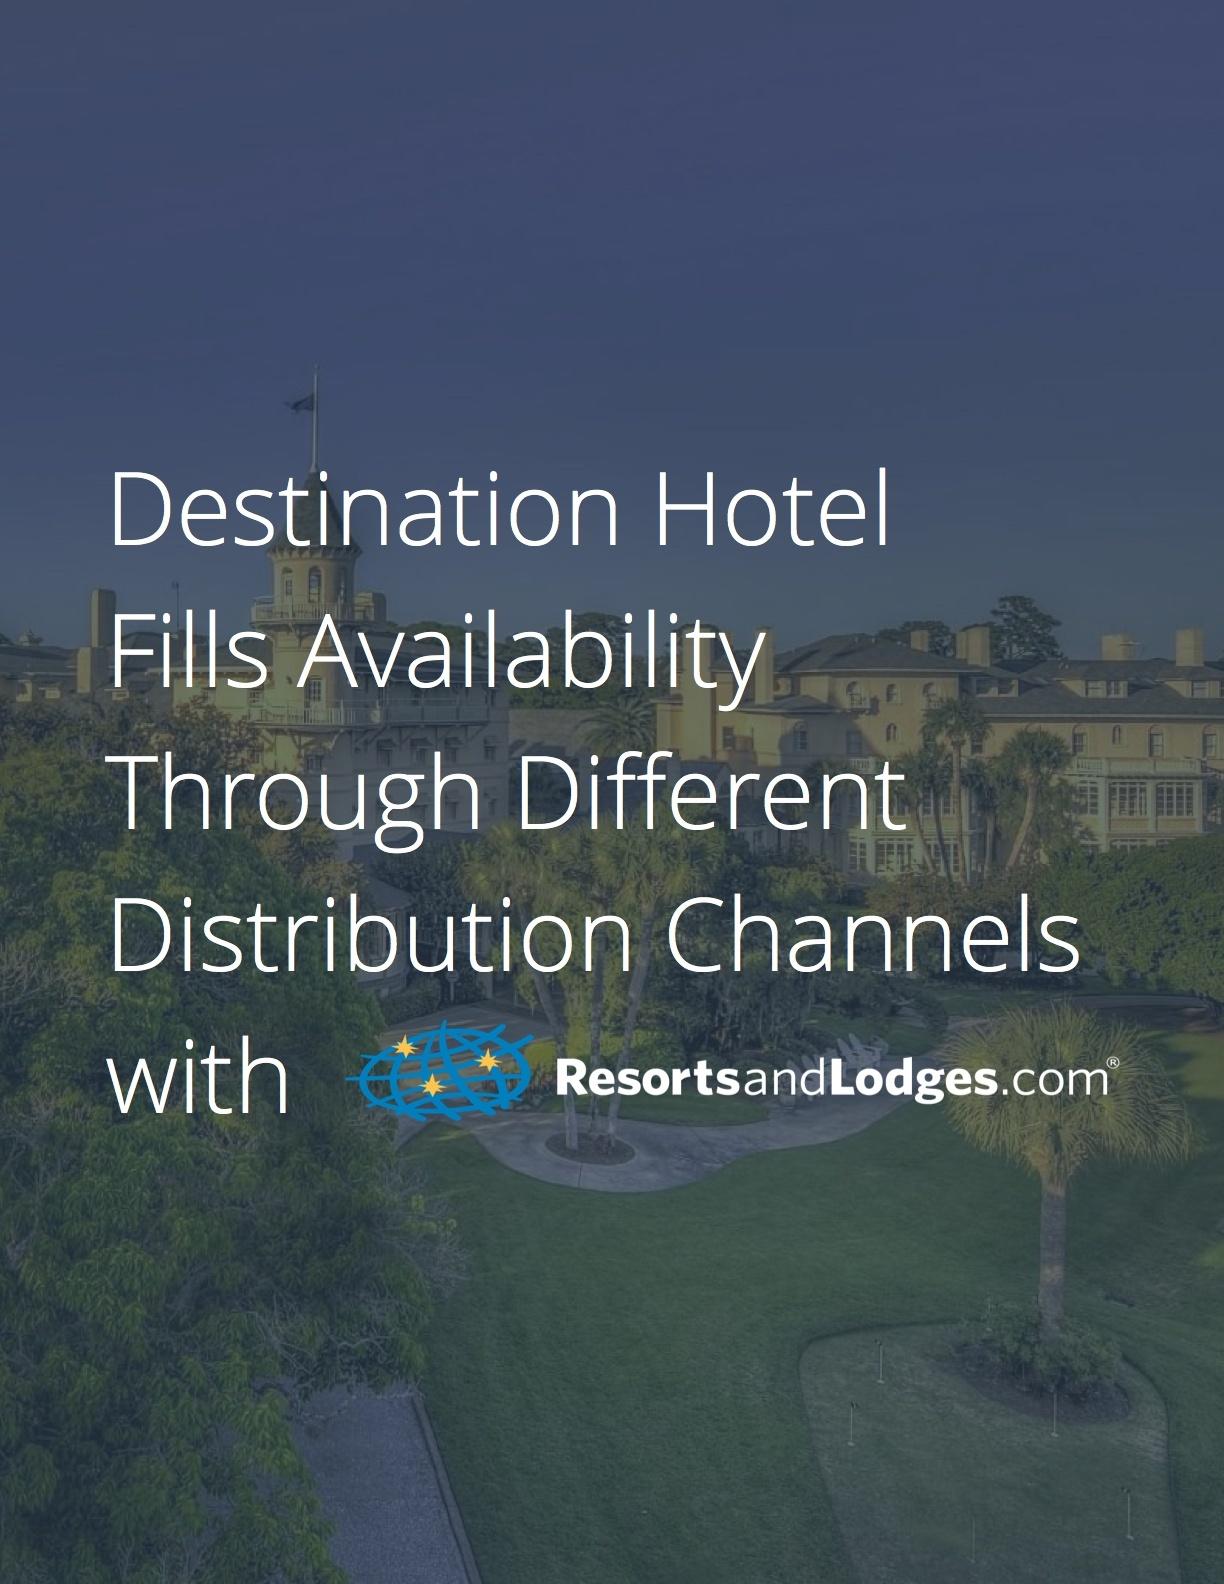 jekyll island club hotel case study cover